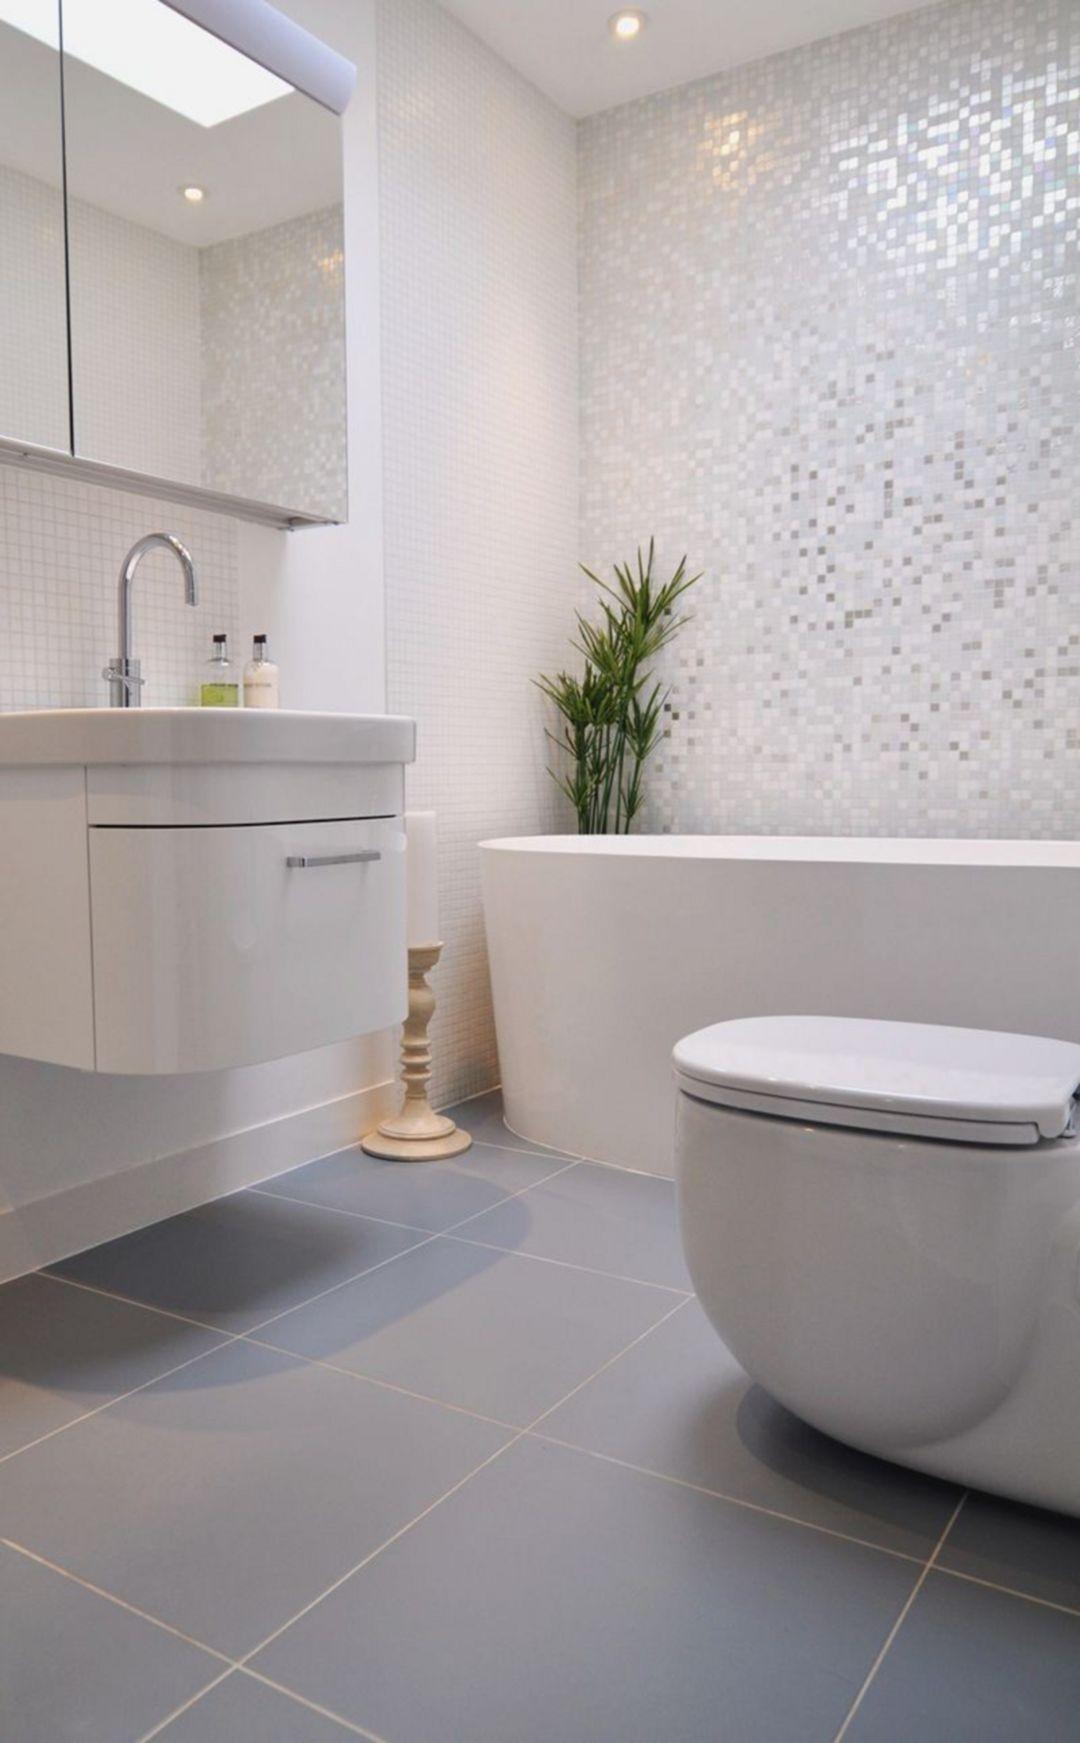 10 Modern Bathroom Designs To Presents Relaxing Atmosphere Grey